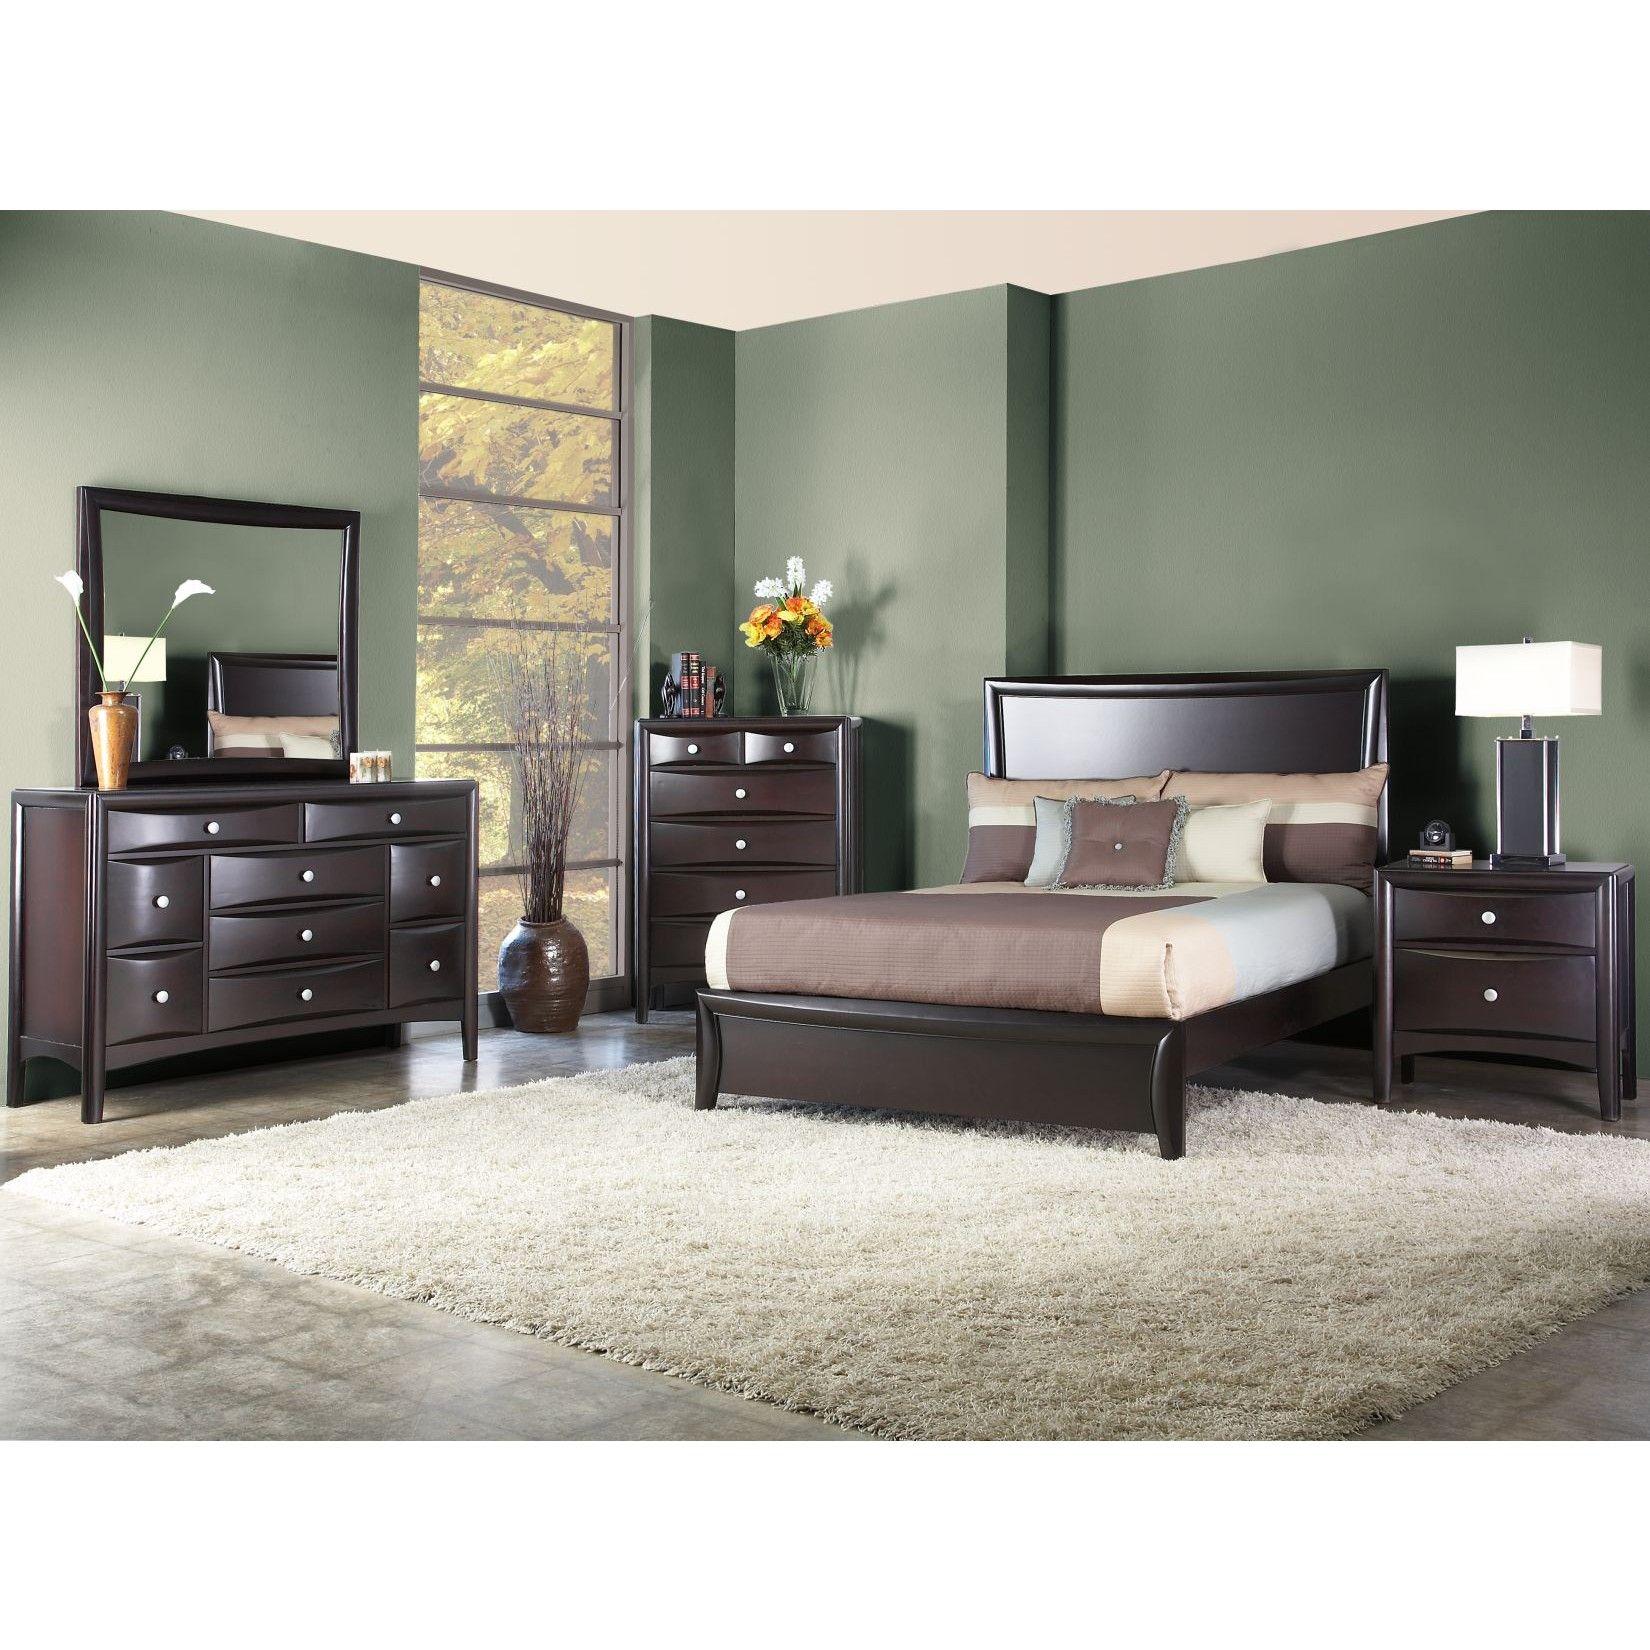 479.00 Brown bedroom walls, Furniture, Alpine furniture